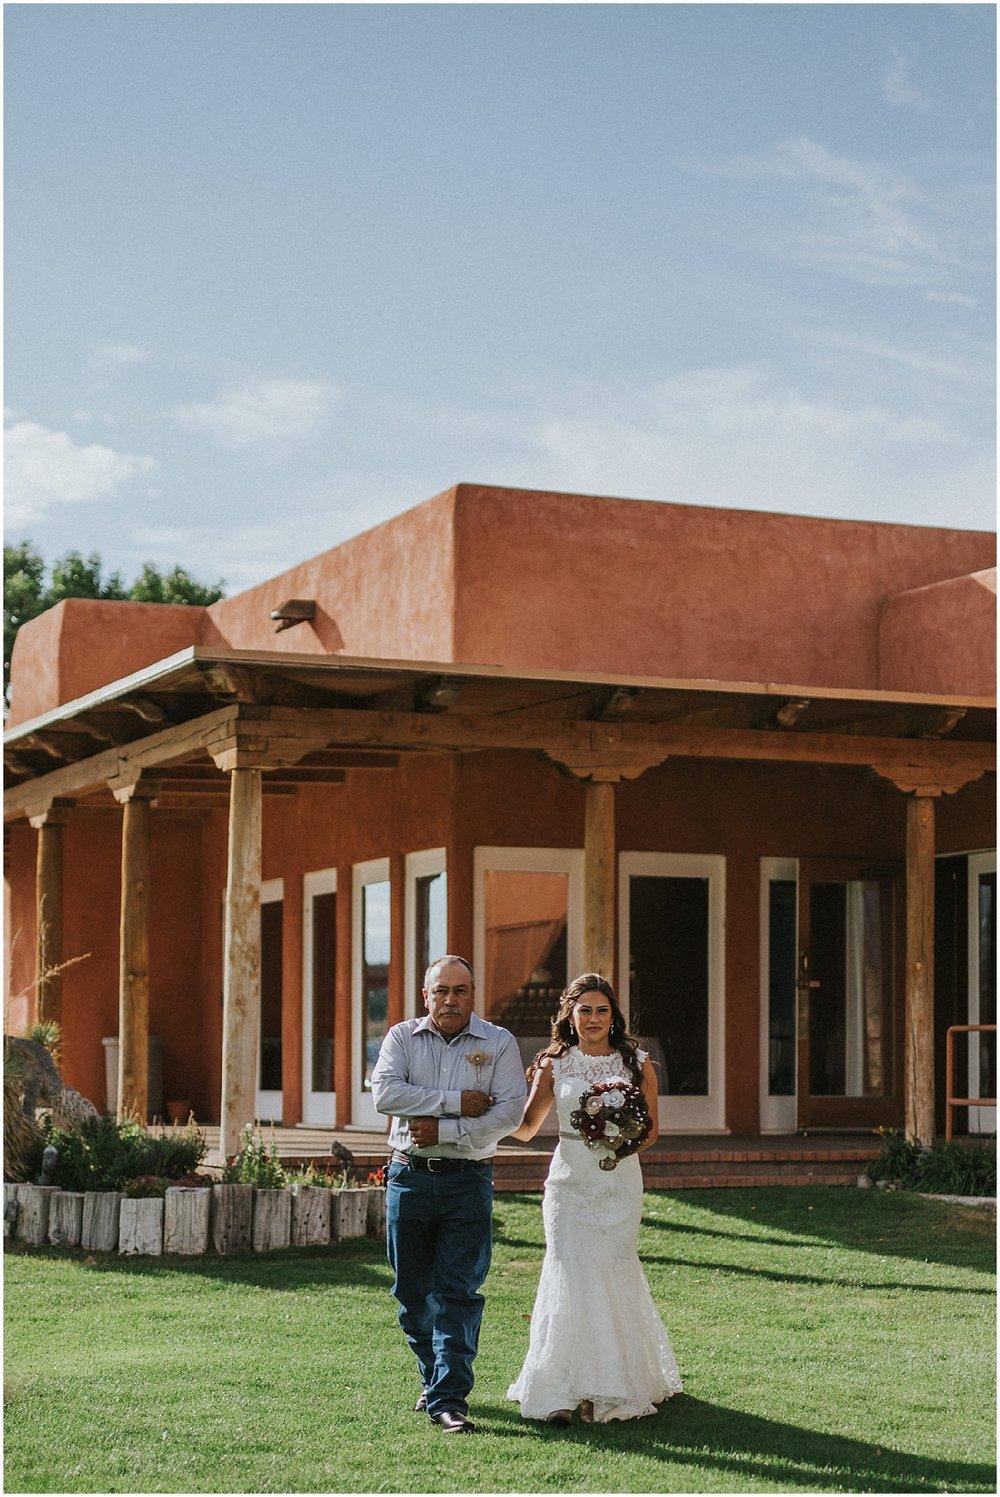 Prairie-Star-Restaurant_Wedding-Photos_Santa-Ana-Pueblo-New-Mexico_Albuquerque-New-Mexico-Wedding-Photographer_0017.jpg